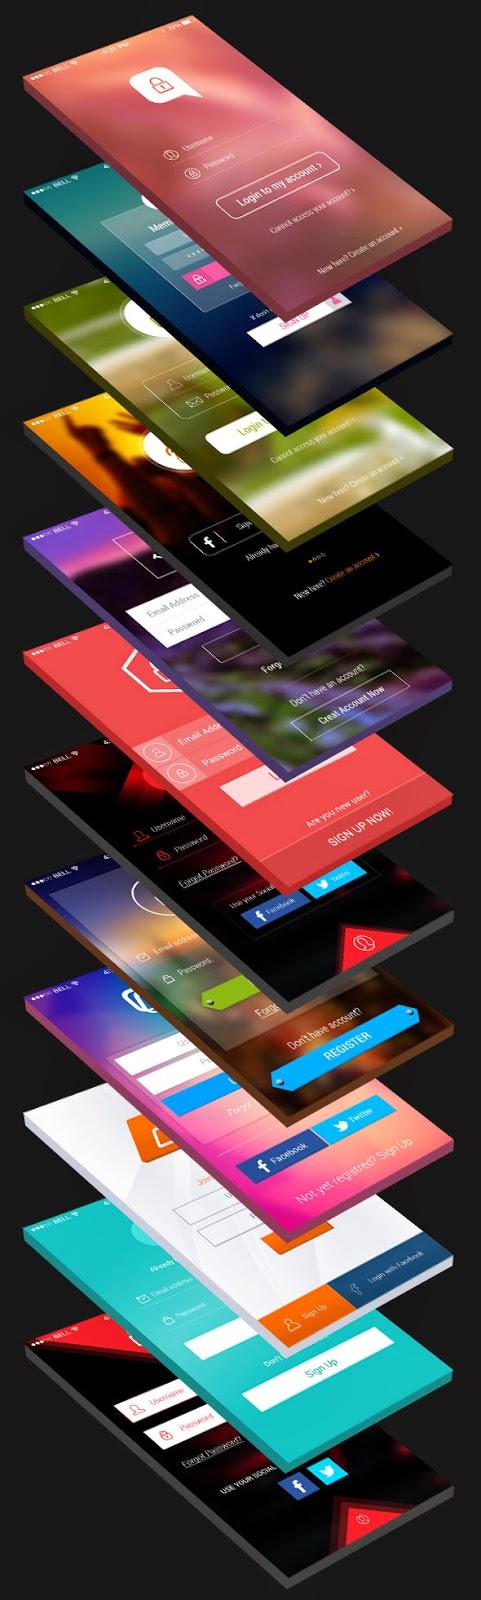 12 Login Screens App UI PSD